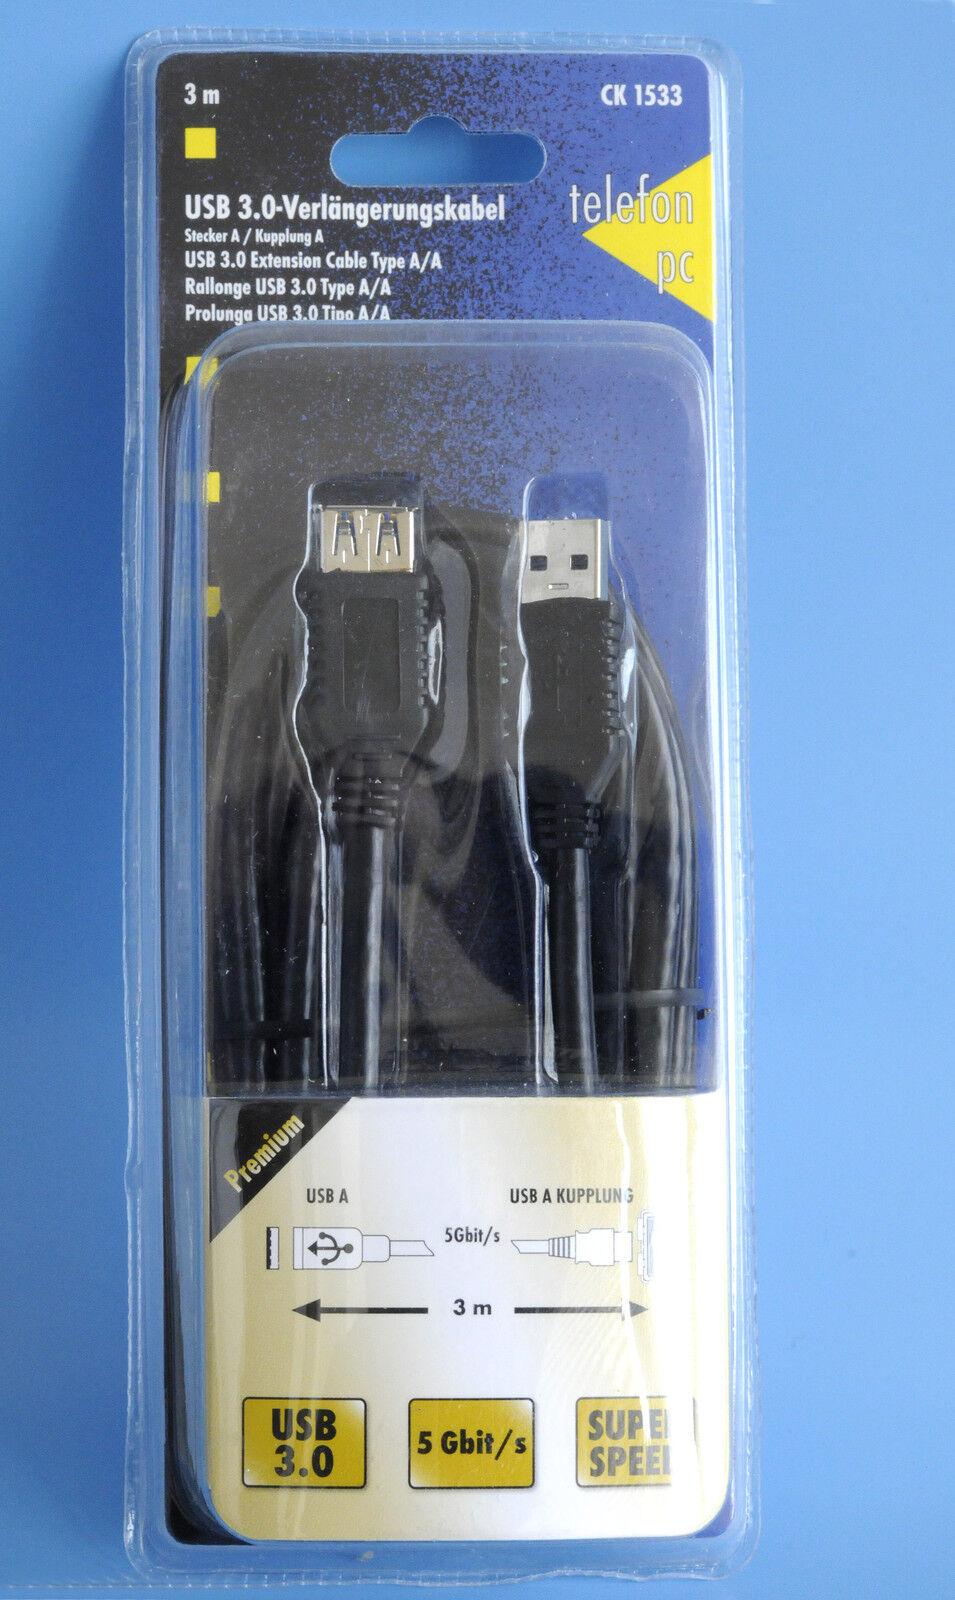 Premium USB 3.0 Extension Cable Super Speed 5 Gbit/S USB A/a Plug 3M PC & Te